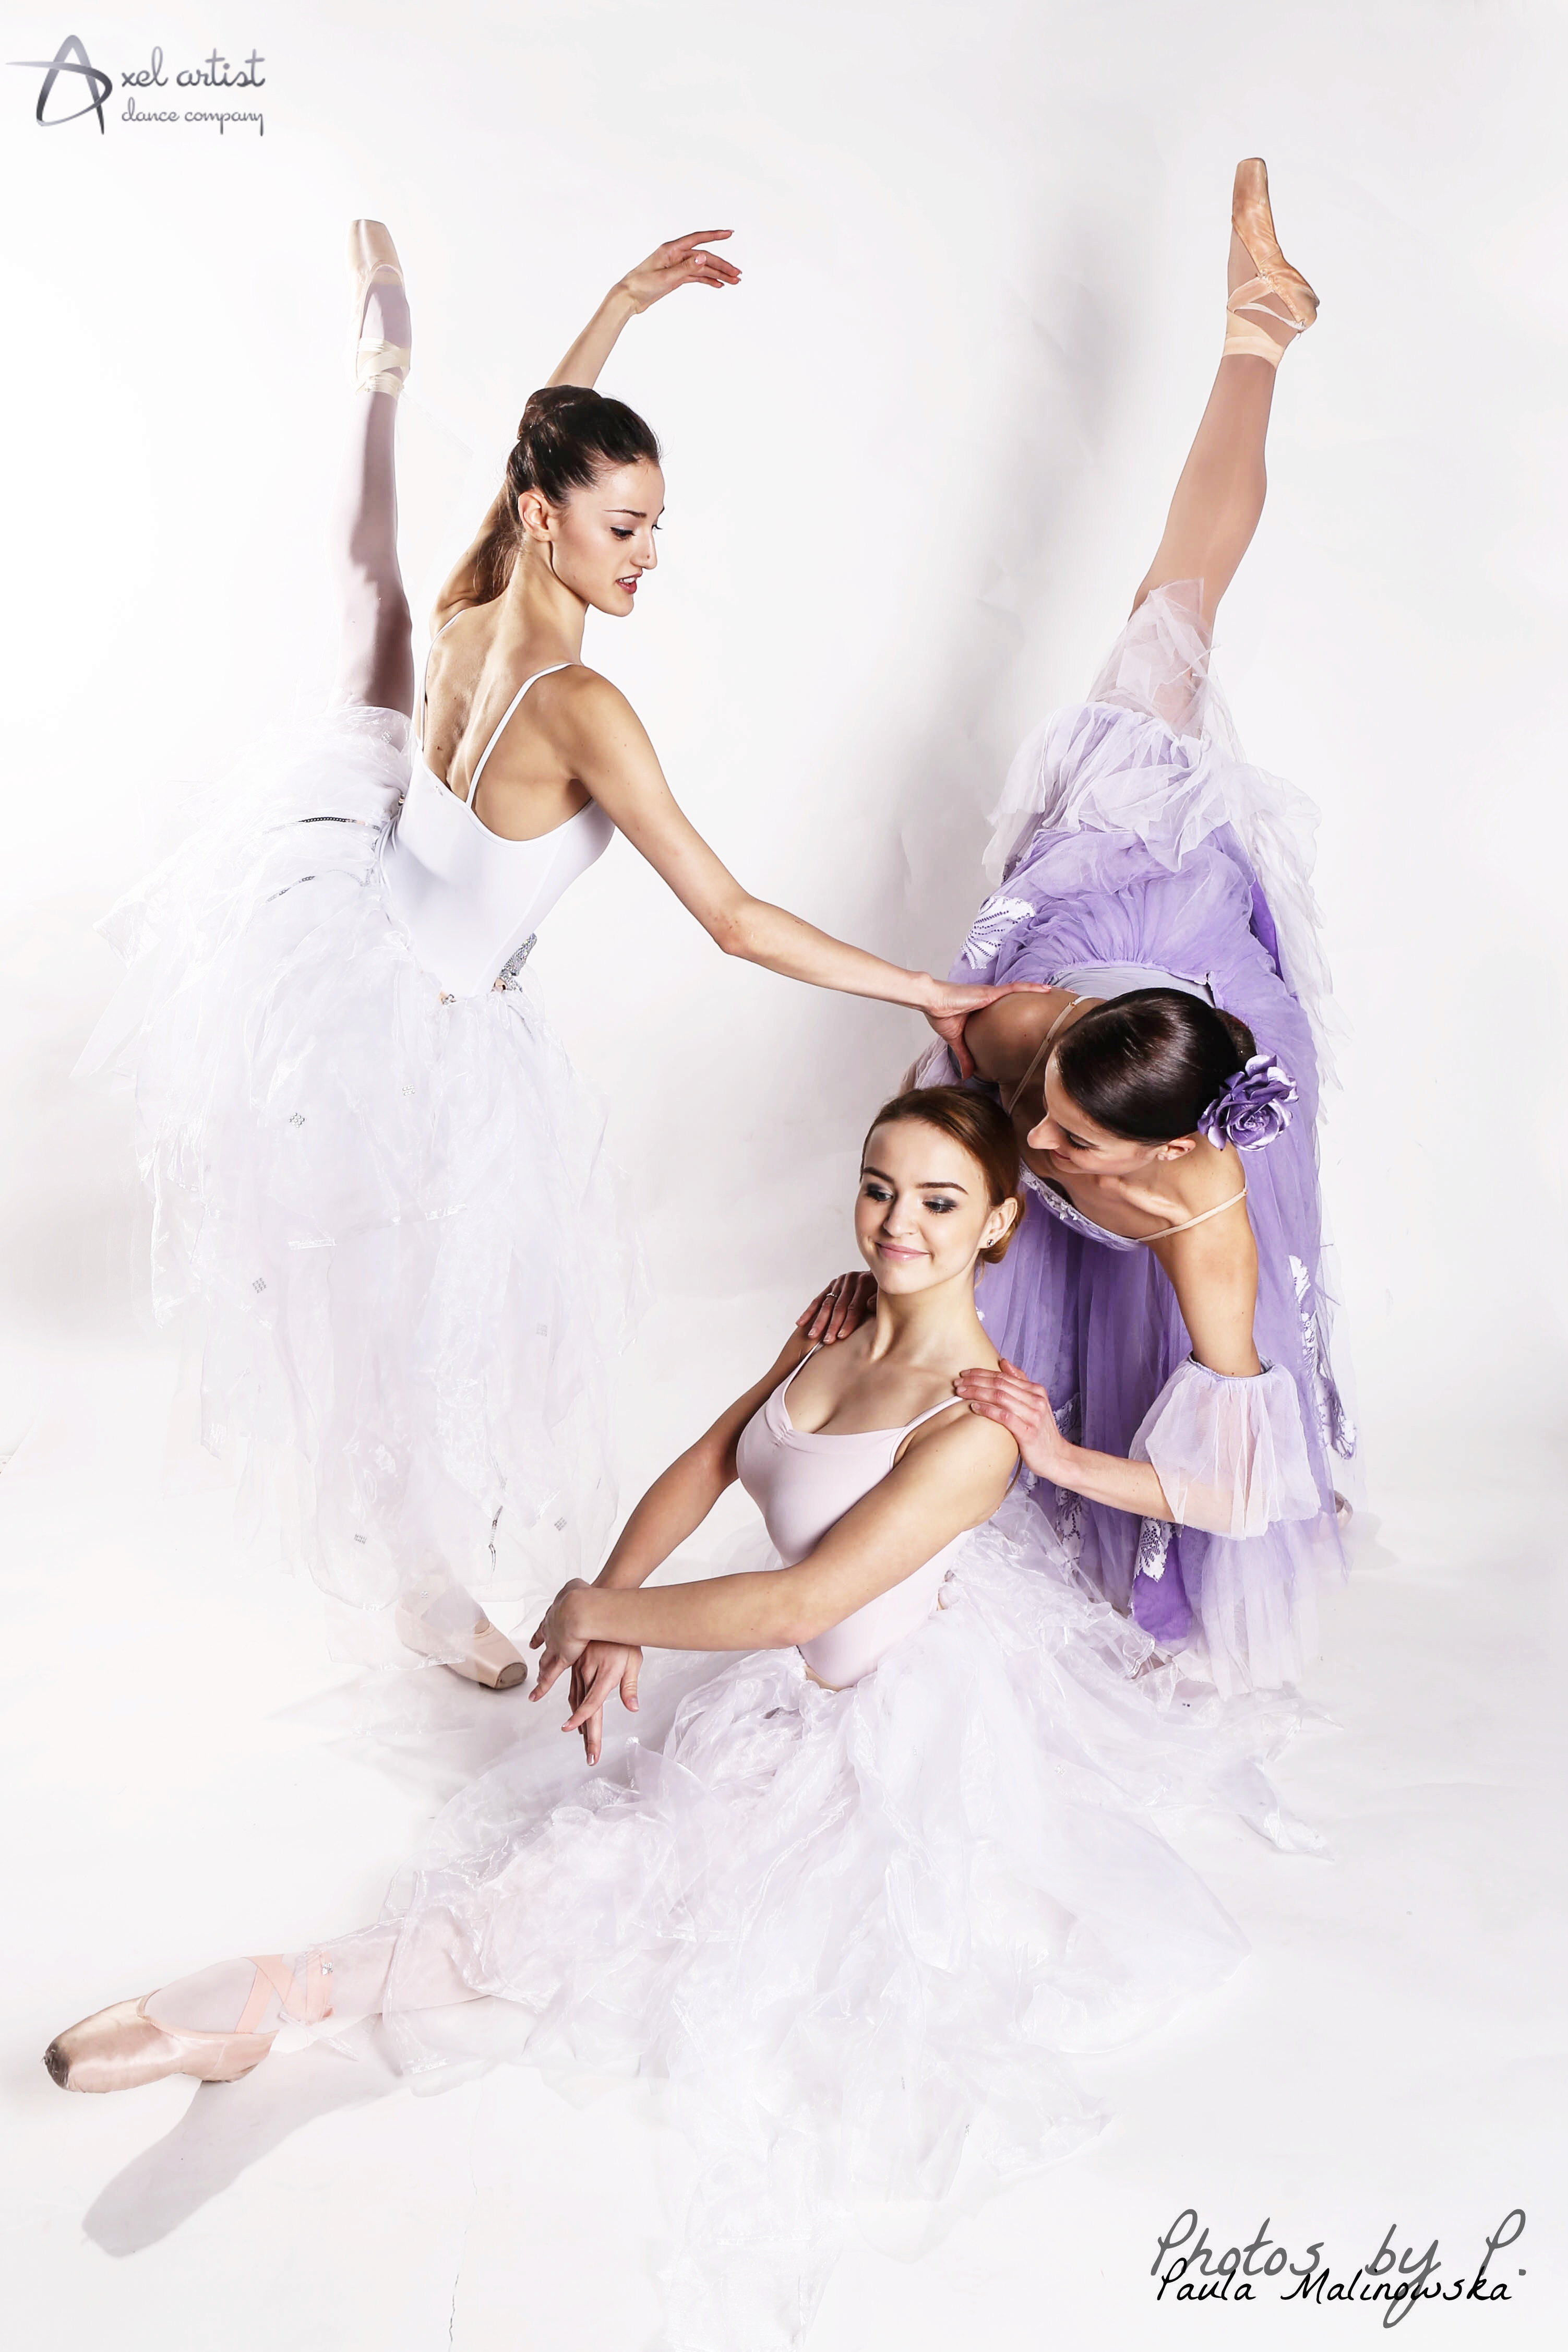 Ballett (2).jpg